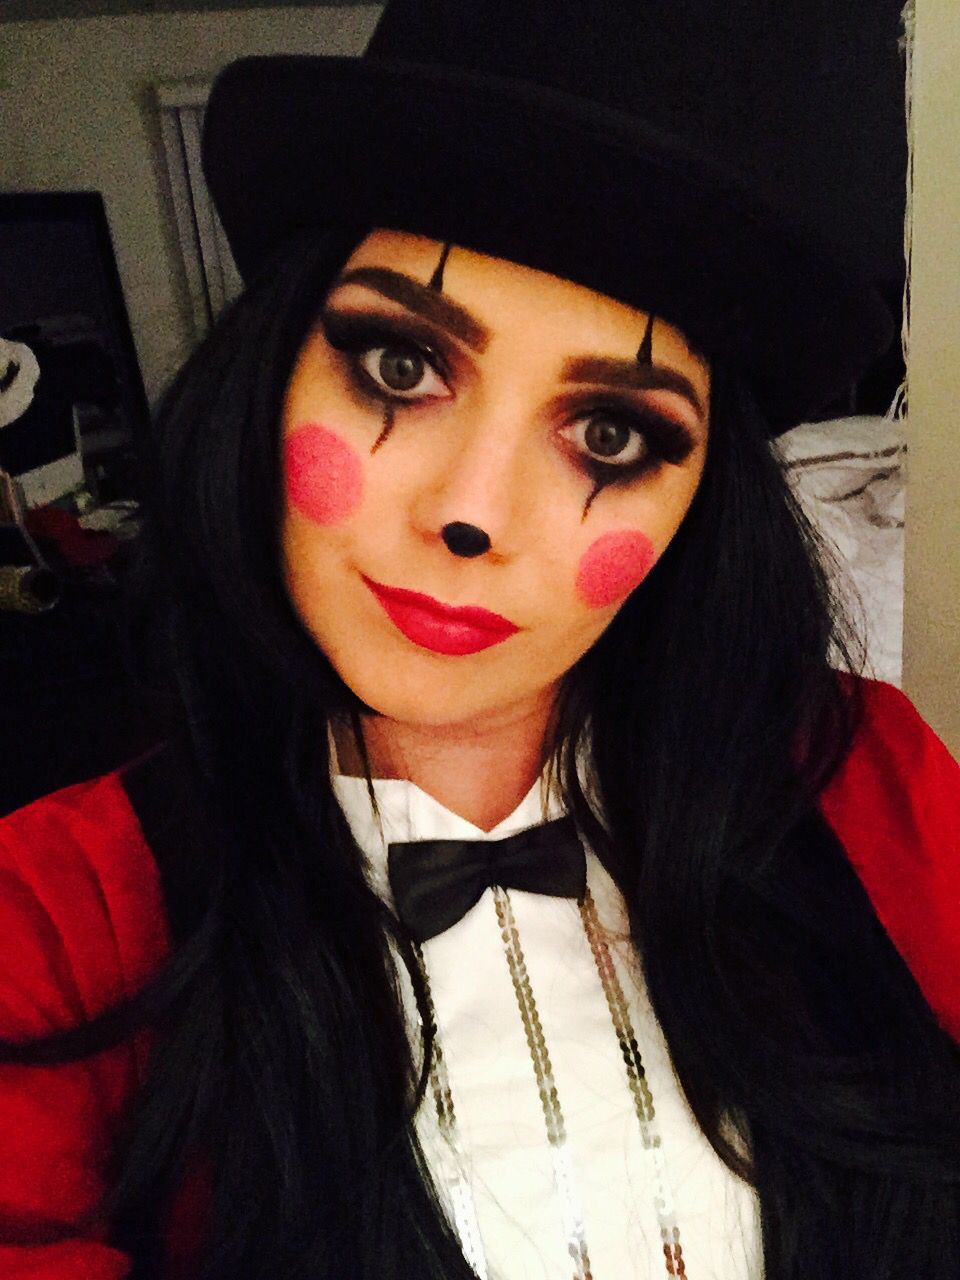 ringmaster clown makeup halloween clown makeup. Black Bedroom Furniture Sets. Home Design Ideas